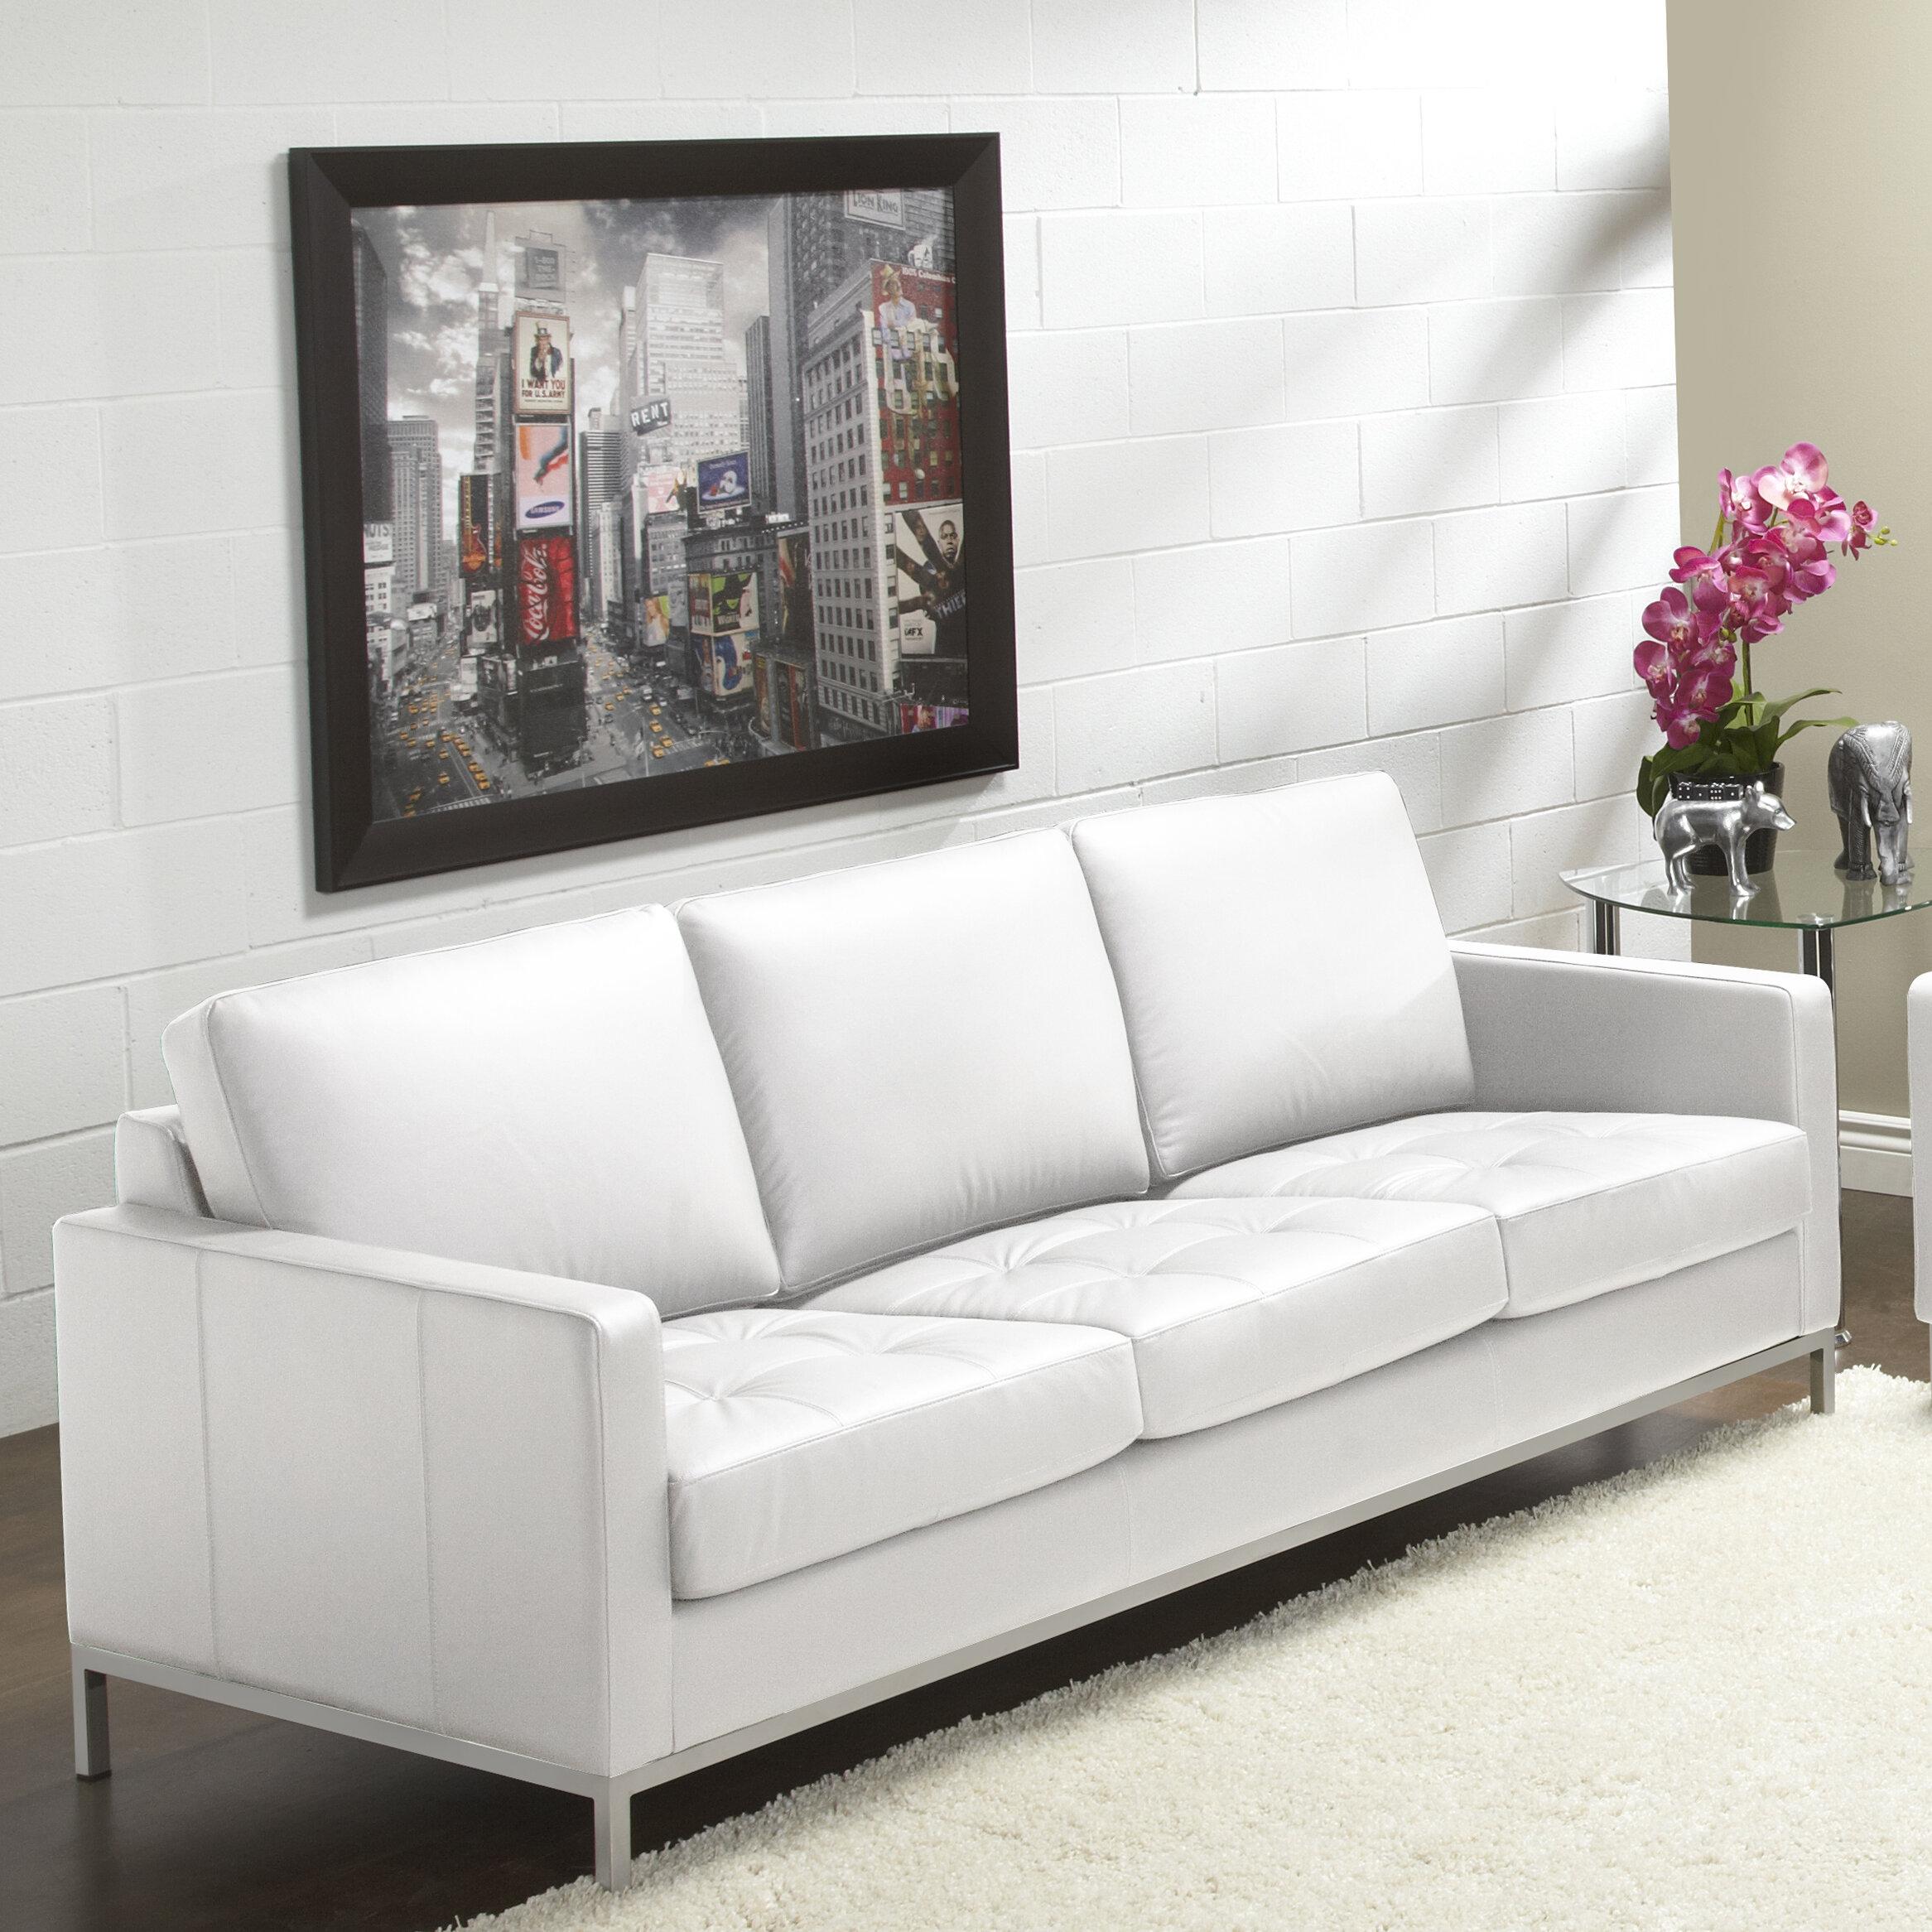 Regency Furniture Sofa Beds Www Redglobalmx Org